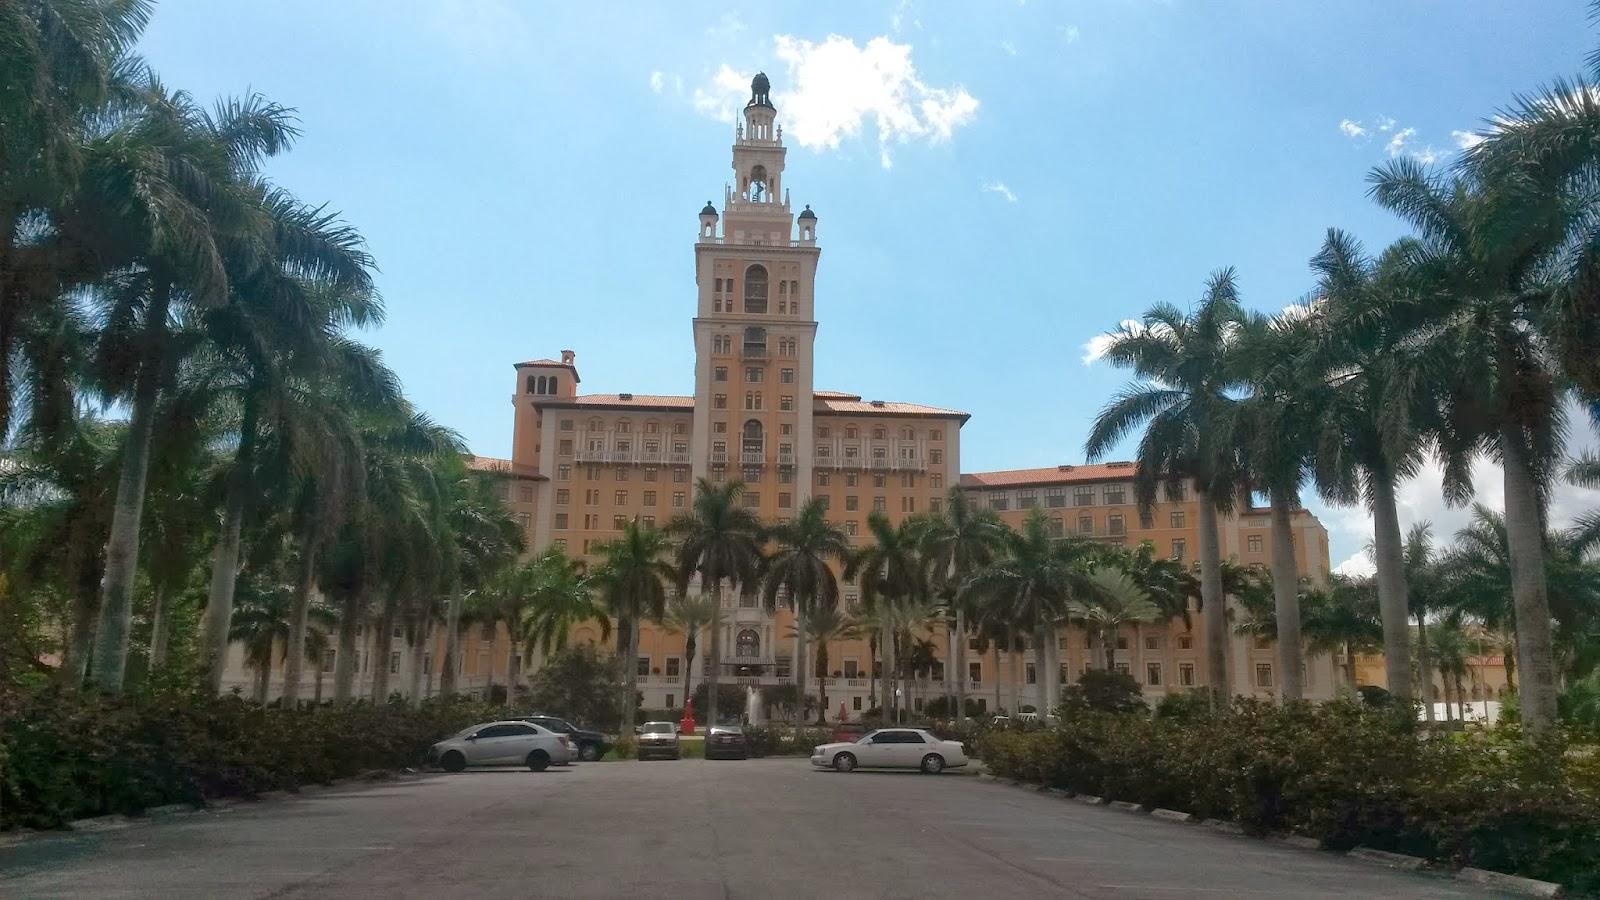 The Biltmore, Coral Gables, Miami, Florida, Elisa N, Blog de Viajes, Lifestyle, Travel